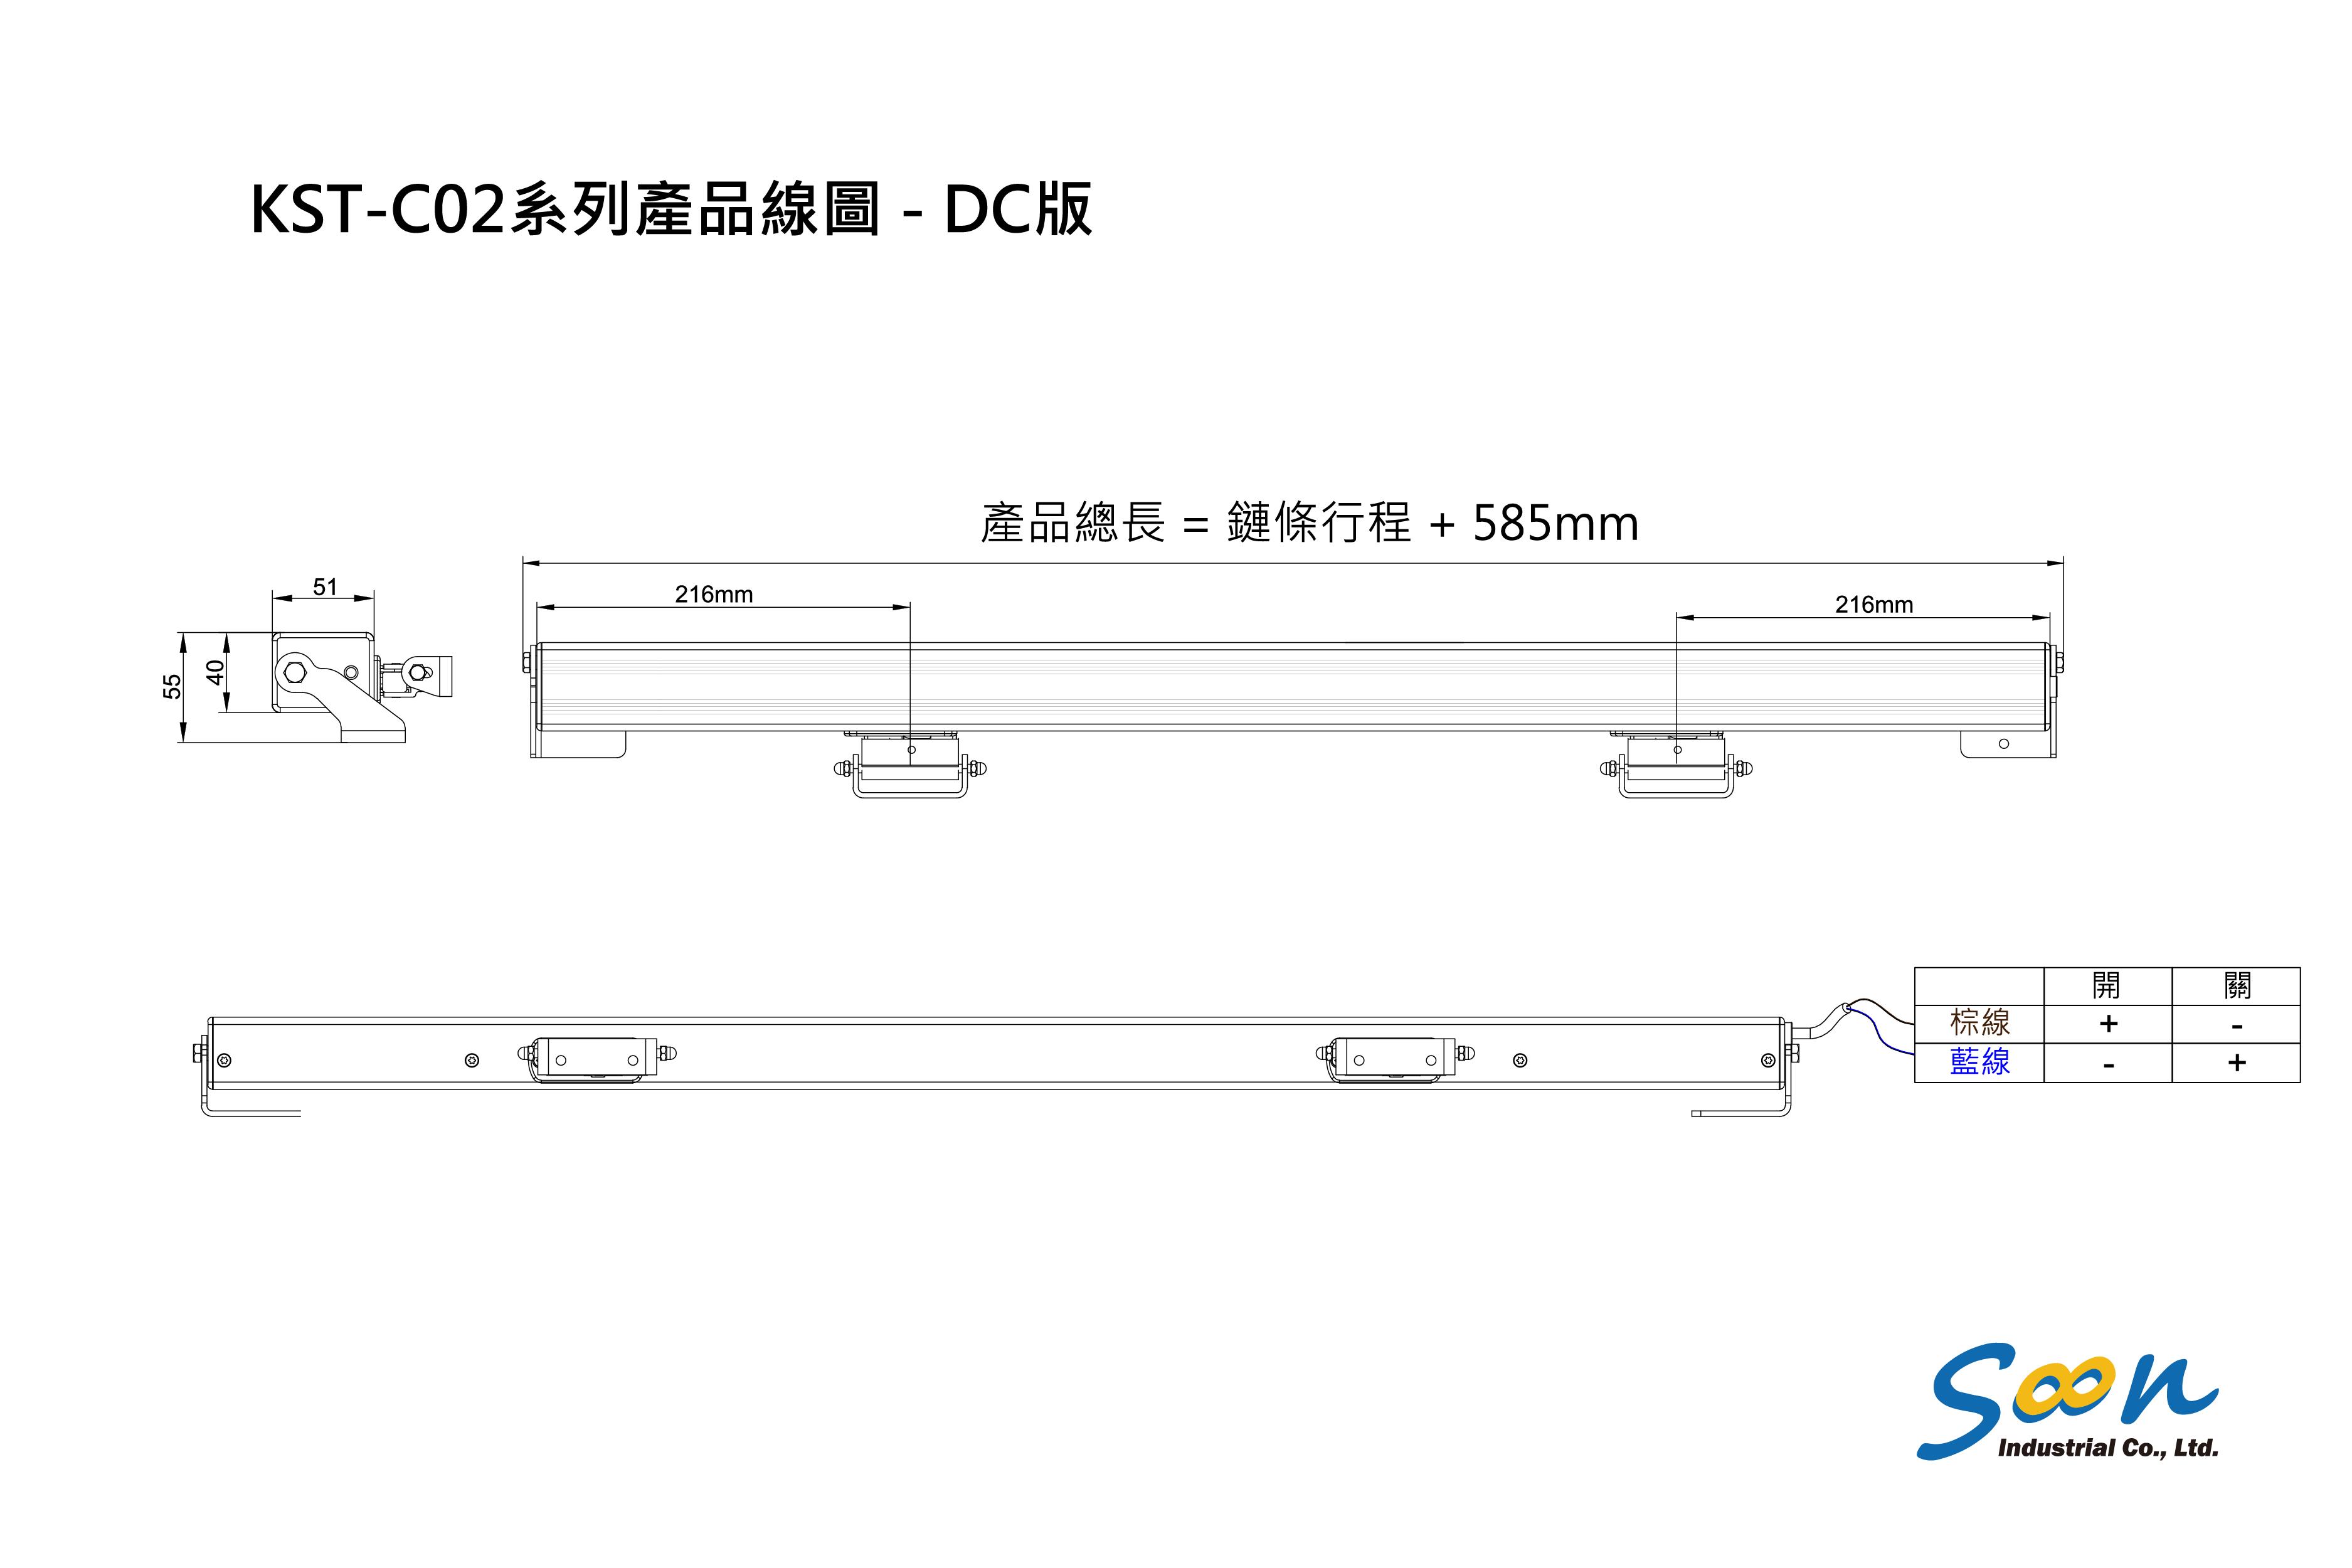 KST-C02雙鏈式電動推桿_DC版_產品尺寸圖